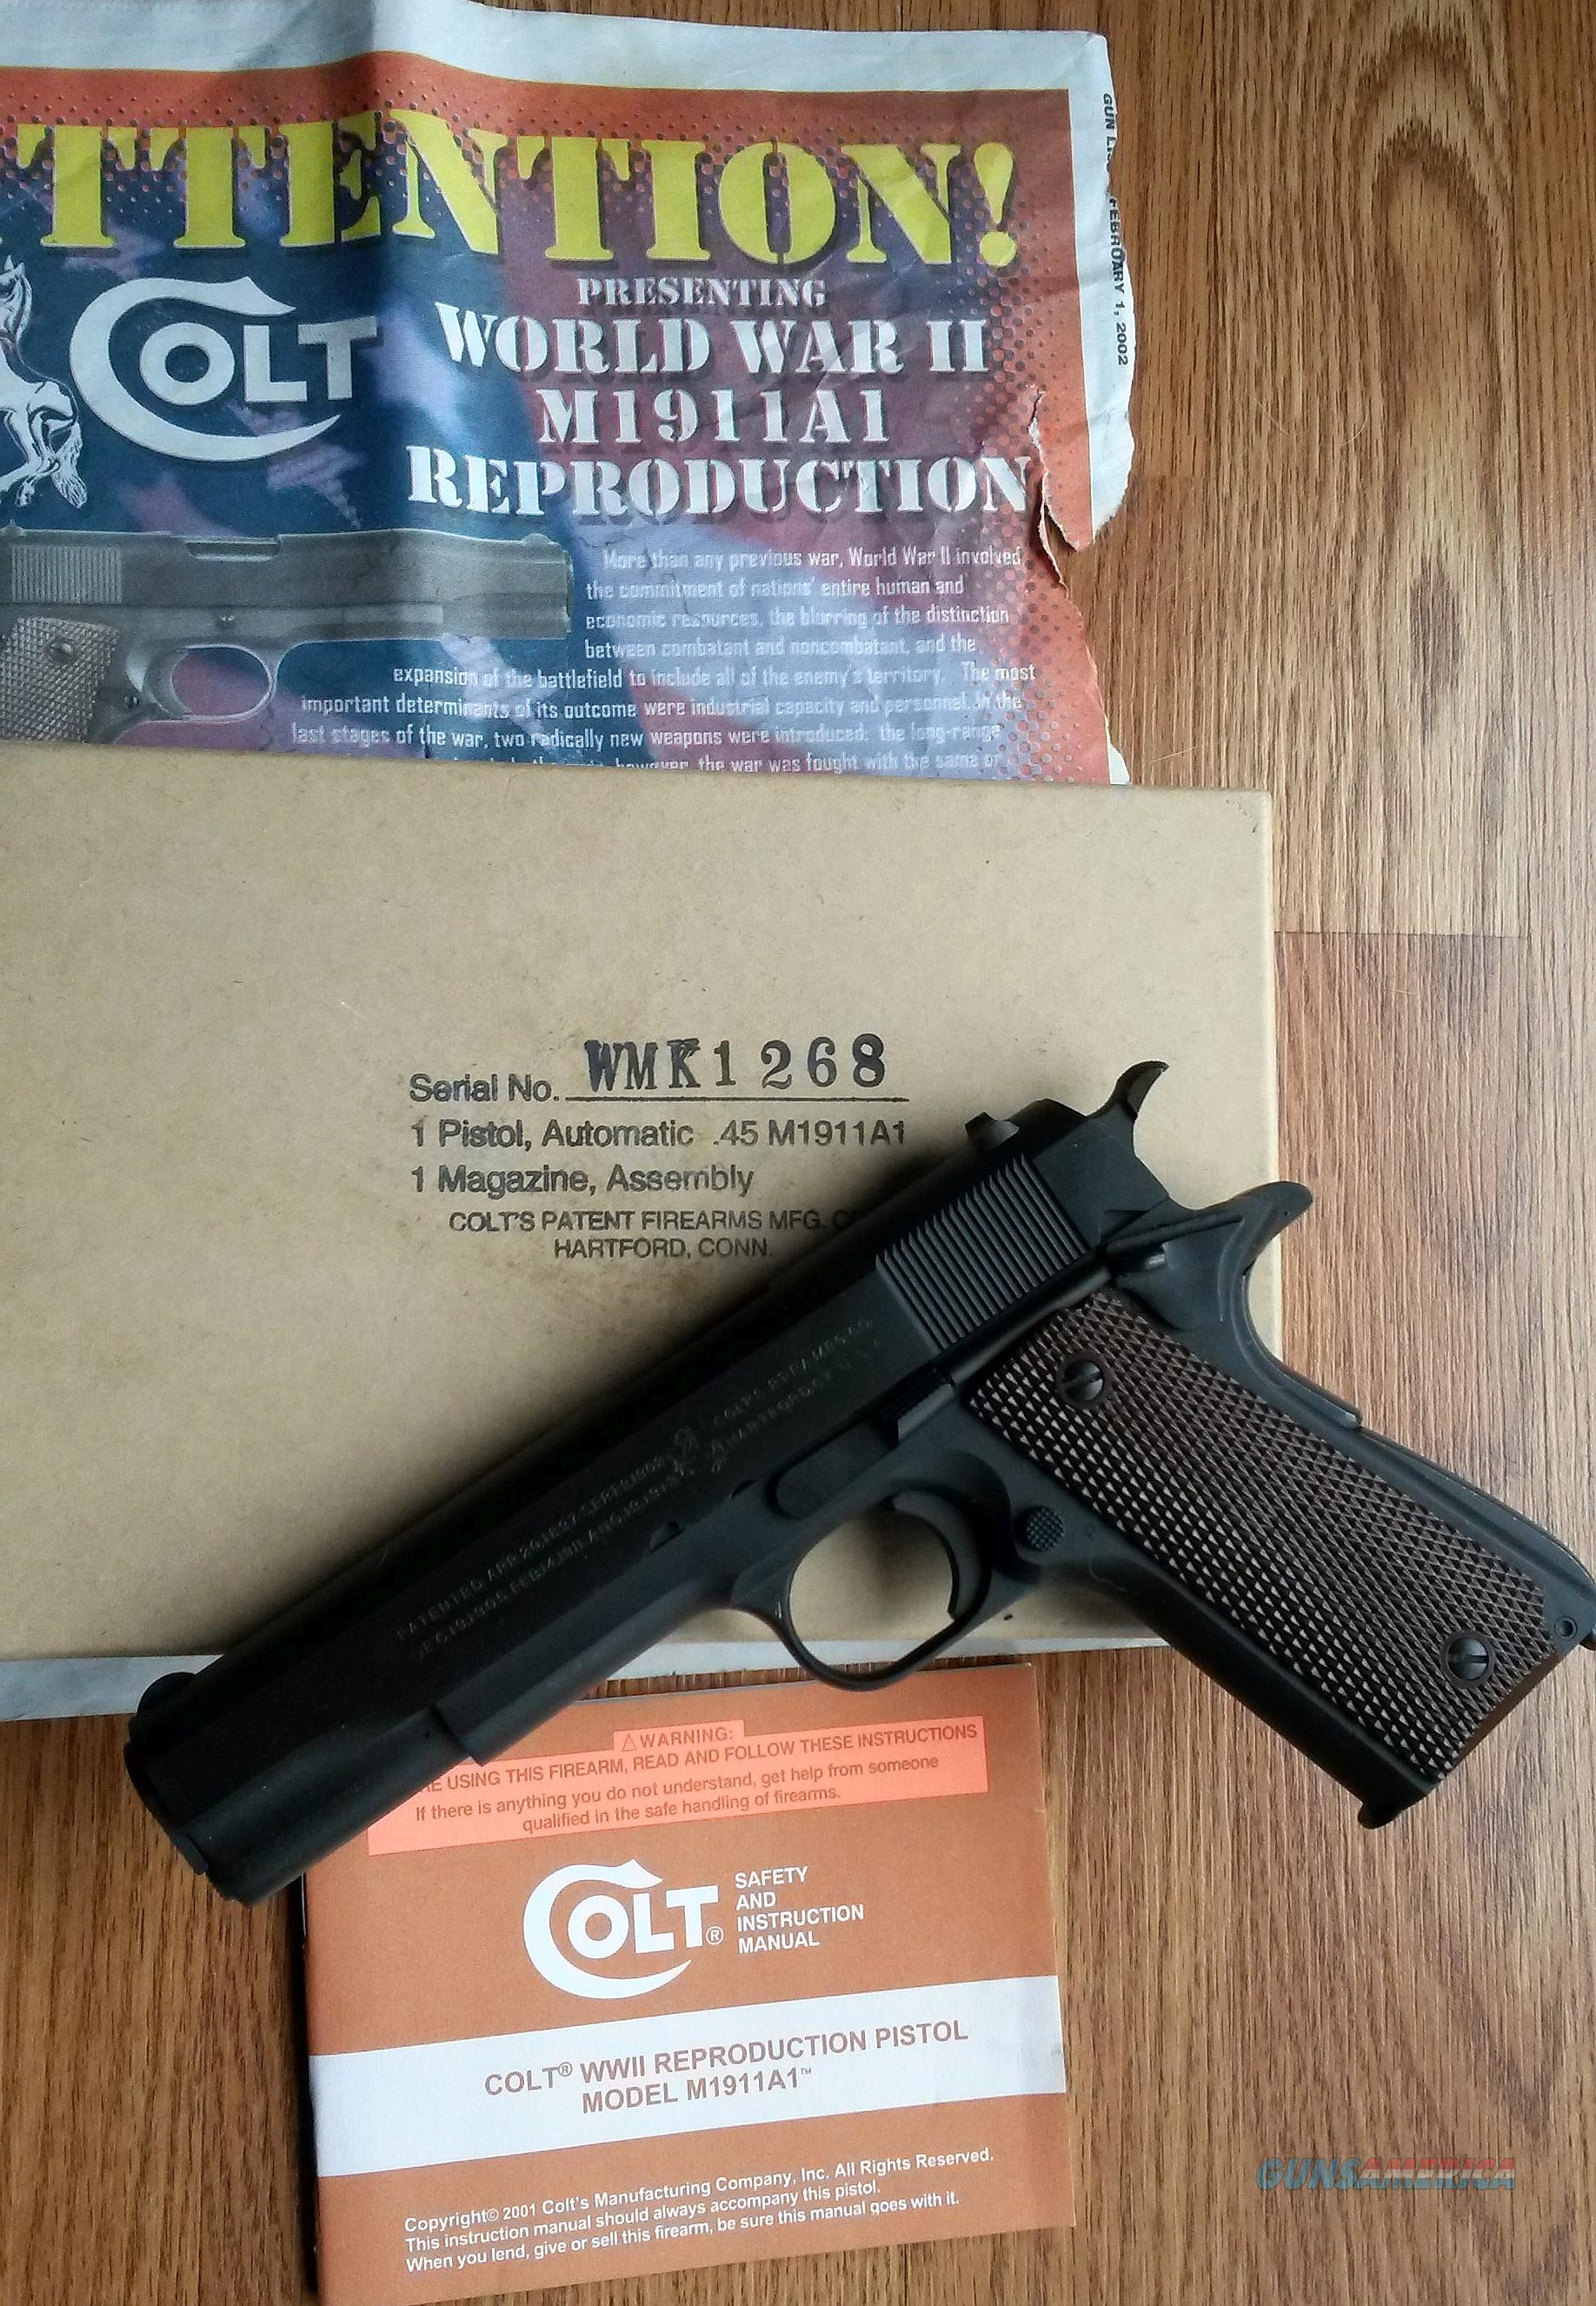 Colt M1911a1 Manual Wiring Diagram Model 1911a1 Parts Wwii Repro Pistol Nib For Sale Rh Gunsamerica Com 1911 Pdf